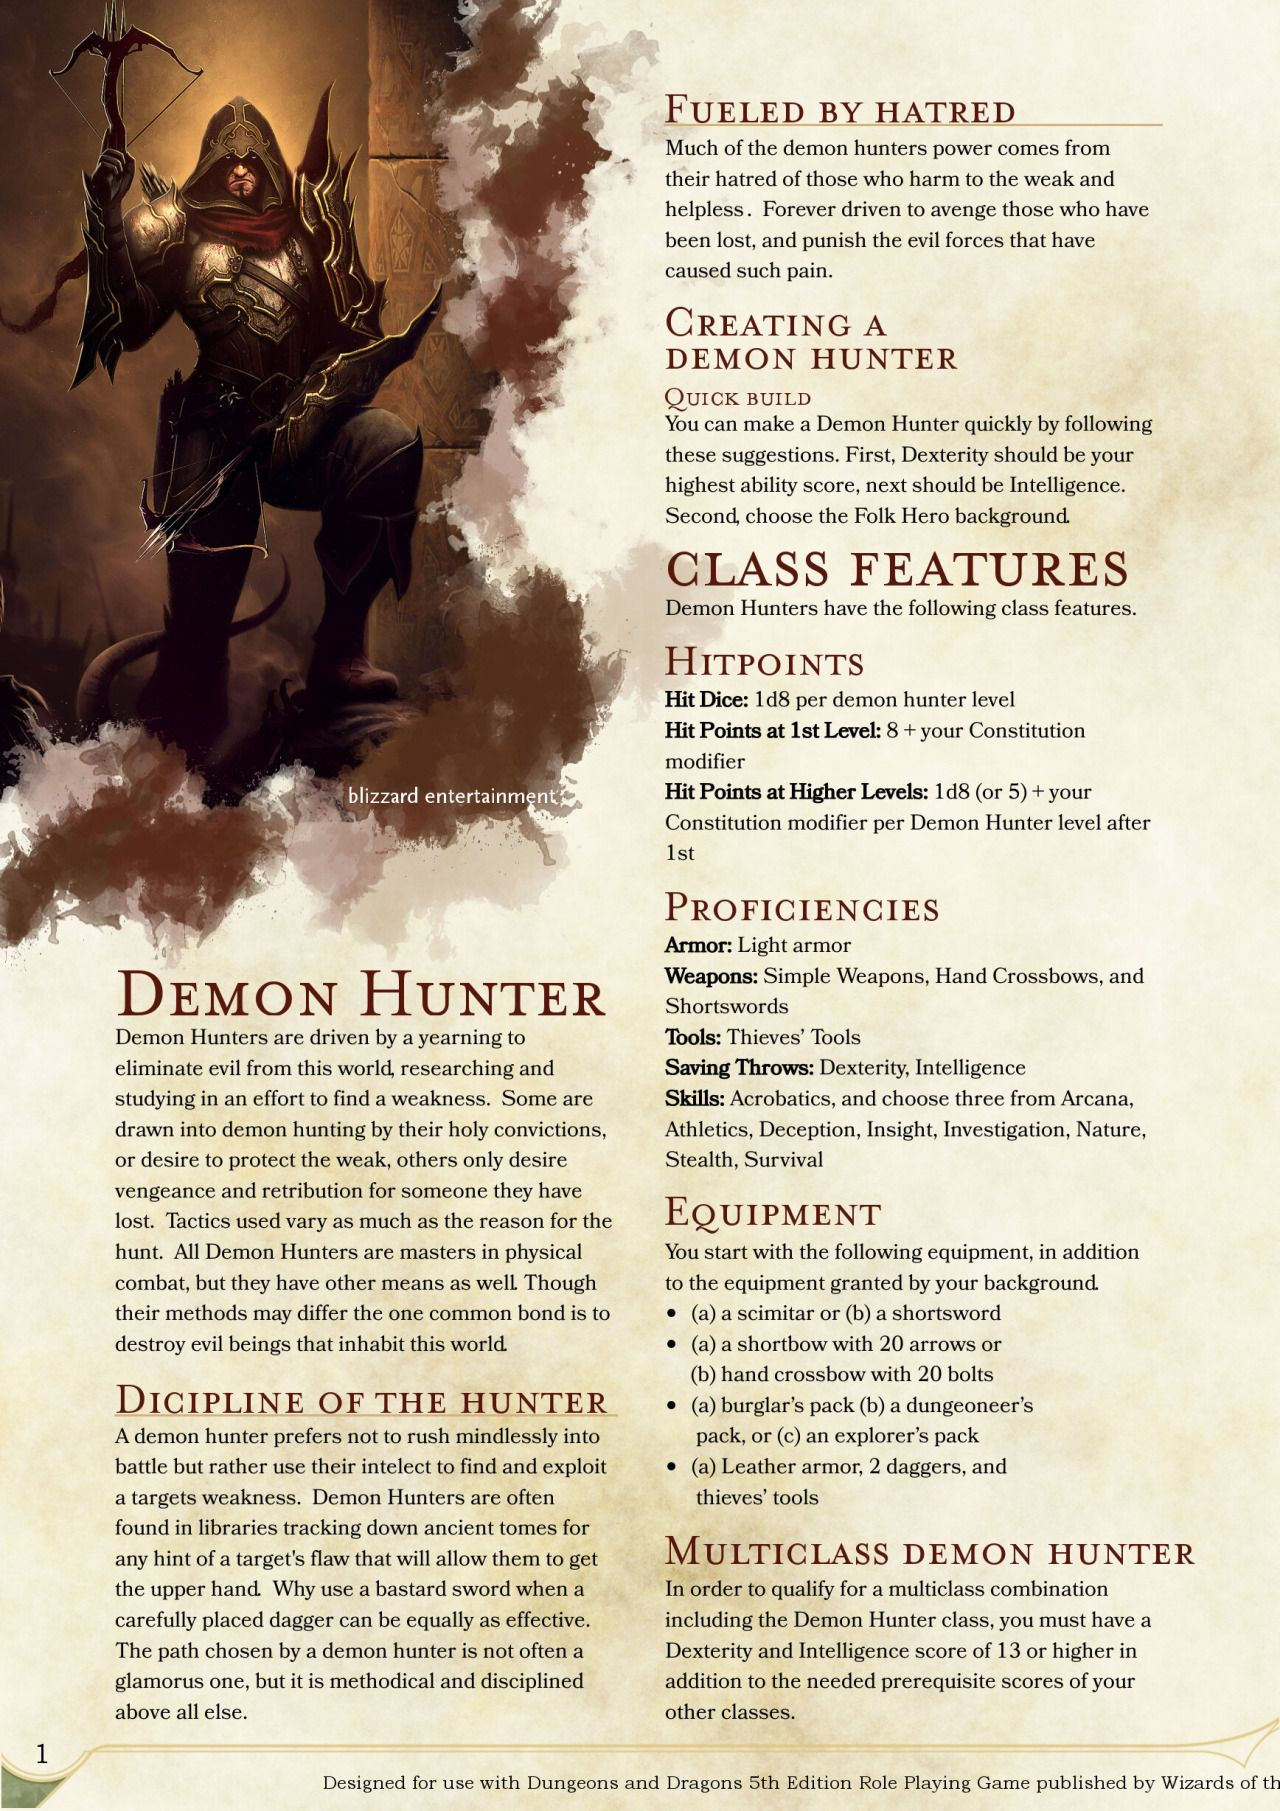 DnD 5e Homebrew — Monsters by Stonestrix | DM Ideas | Pinterest ...